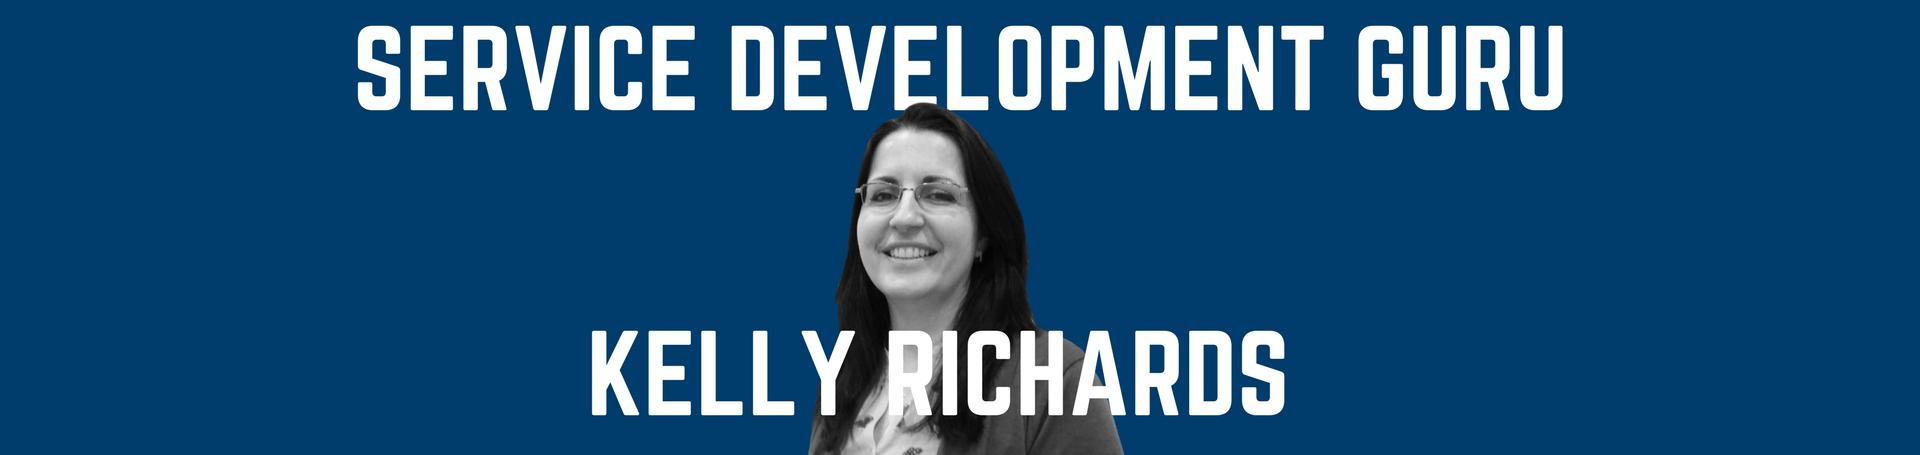 Kelly Richards